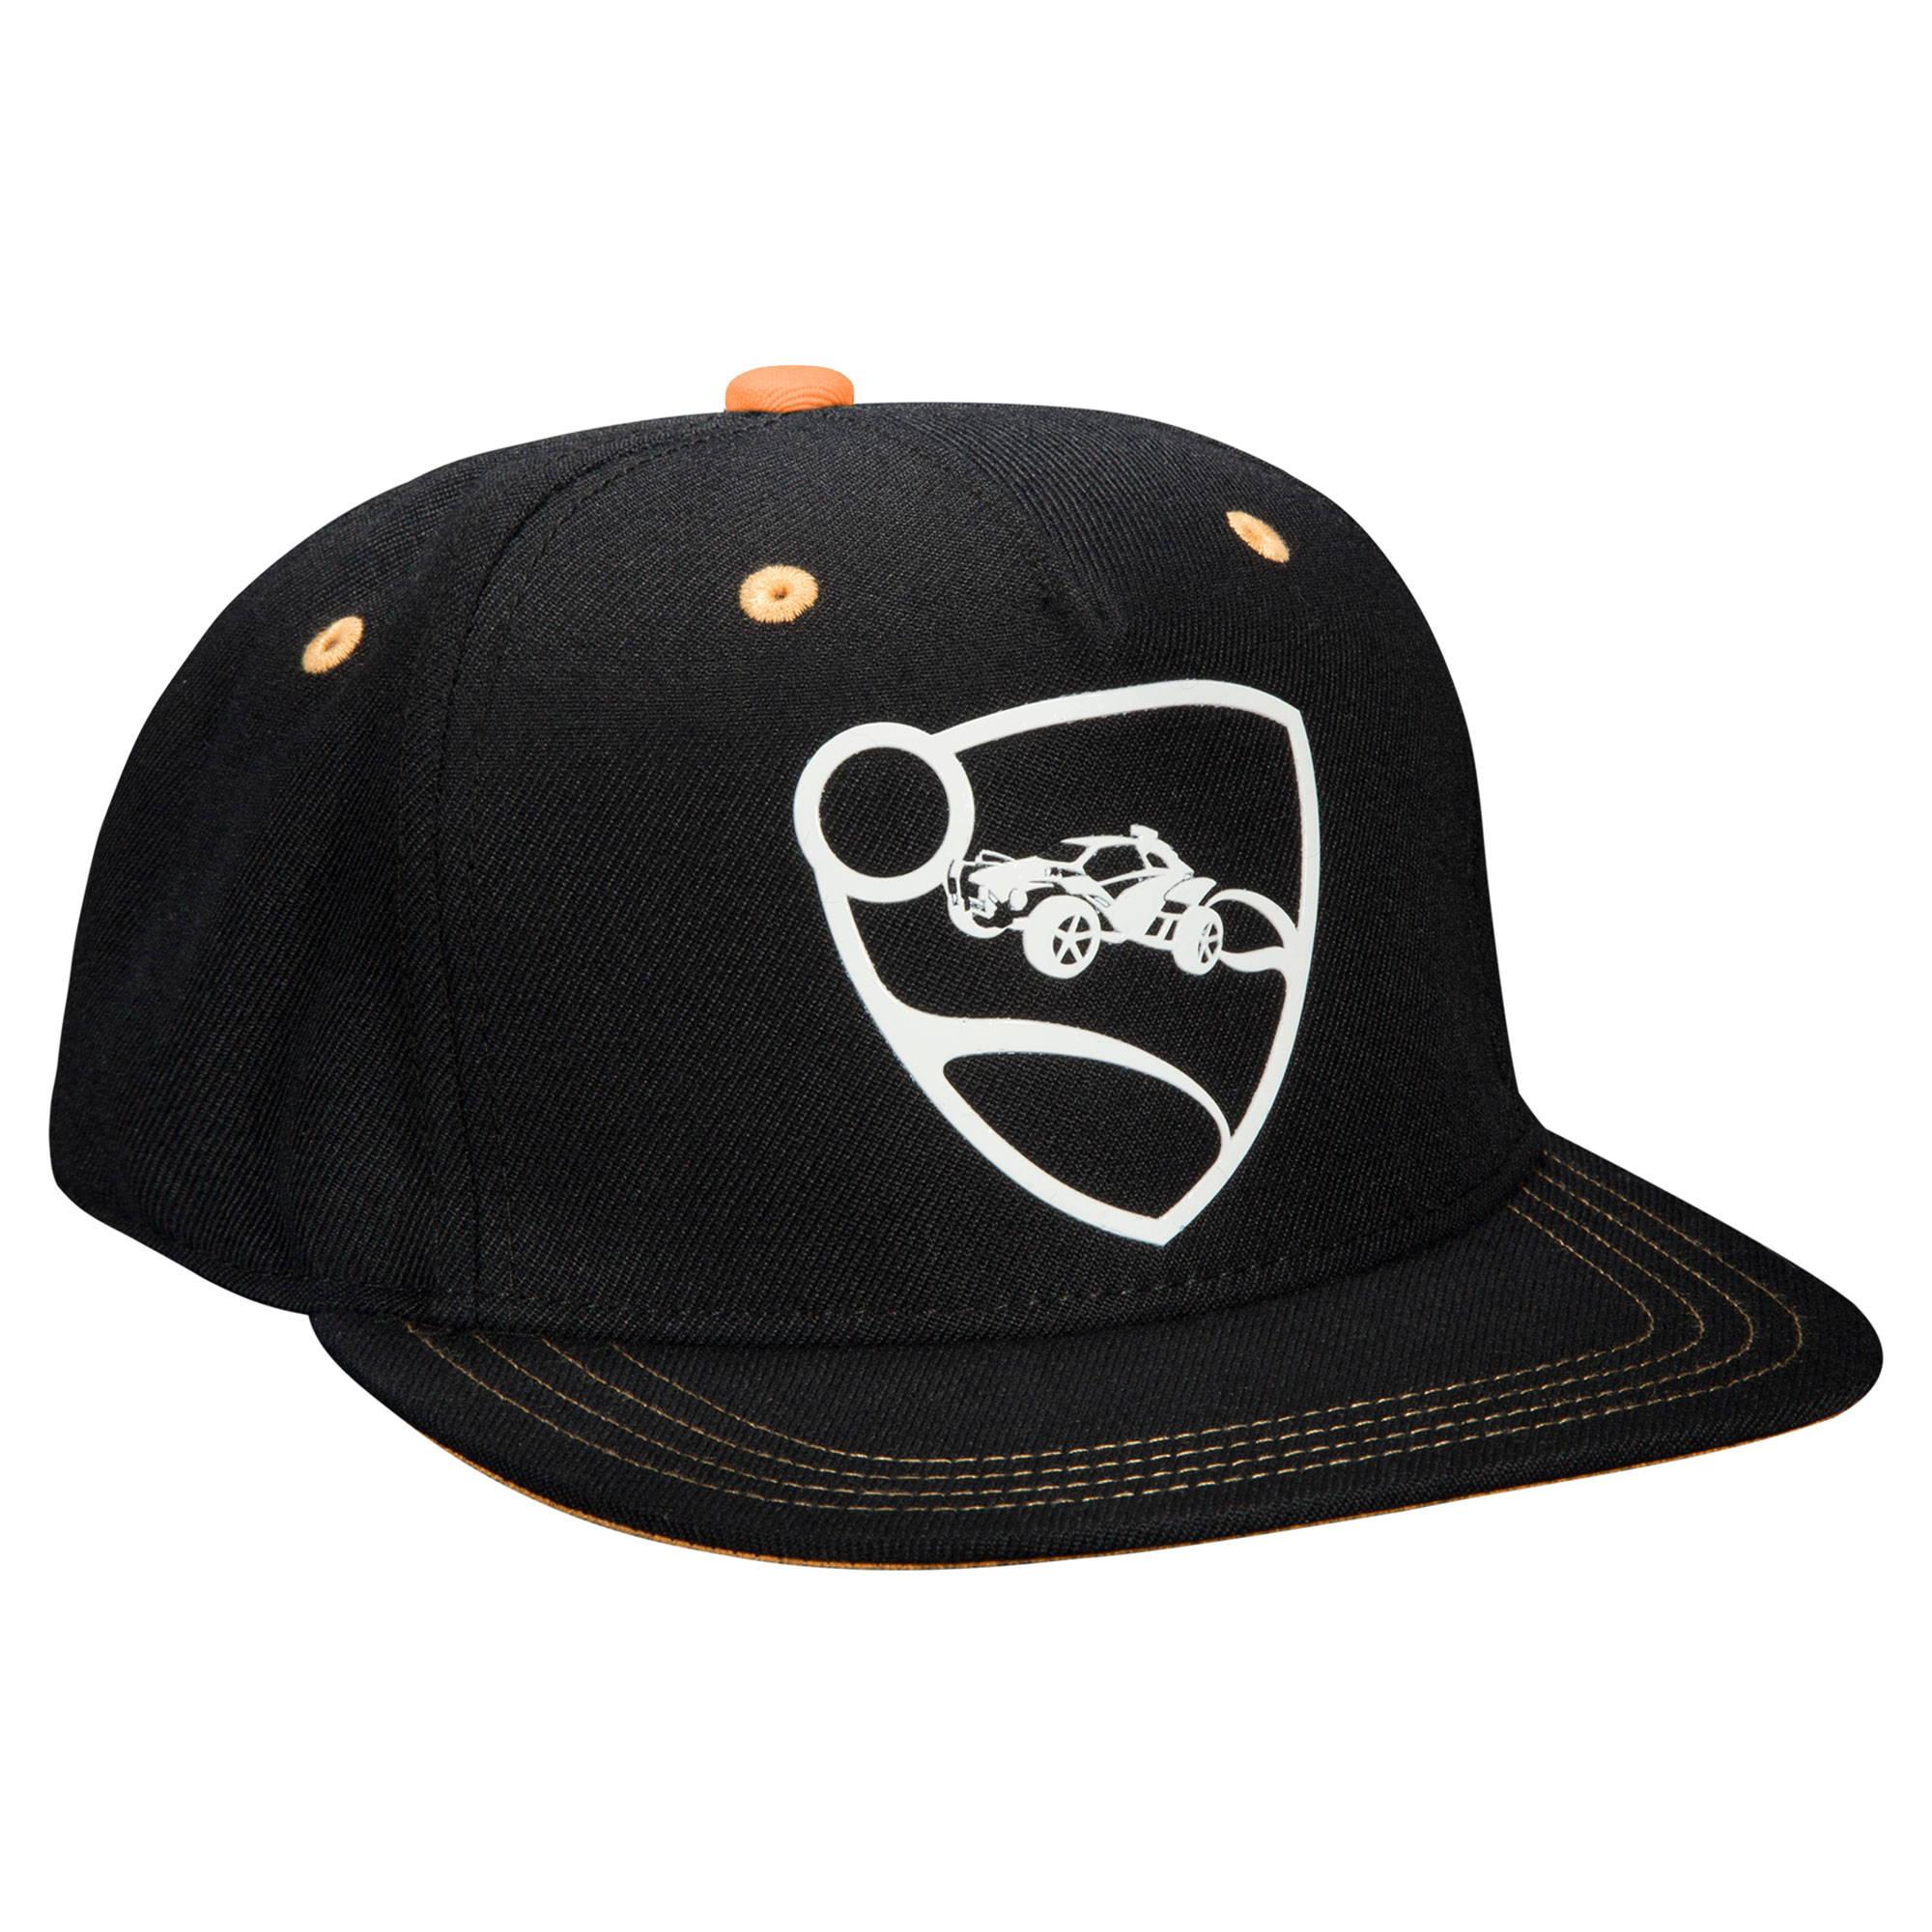 Product photo of the Rocket League Orange Team Snap Back Hat